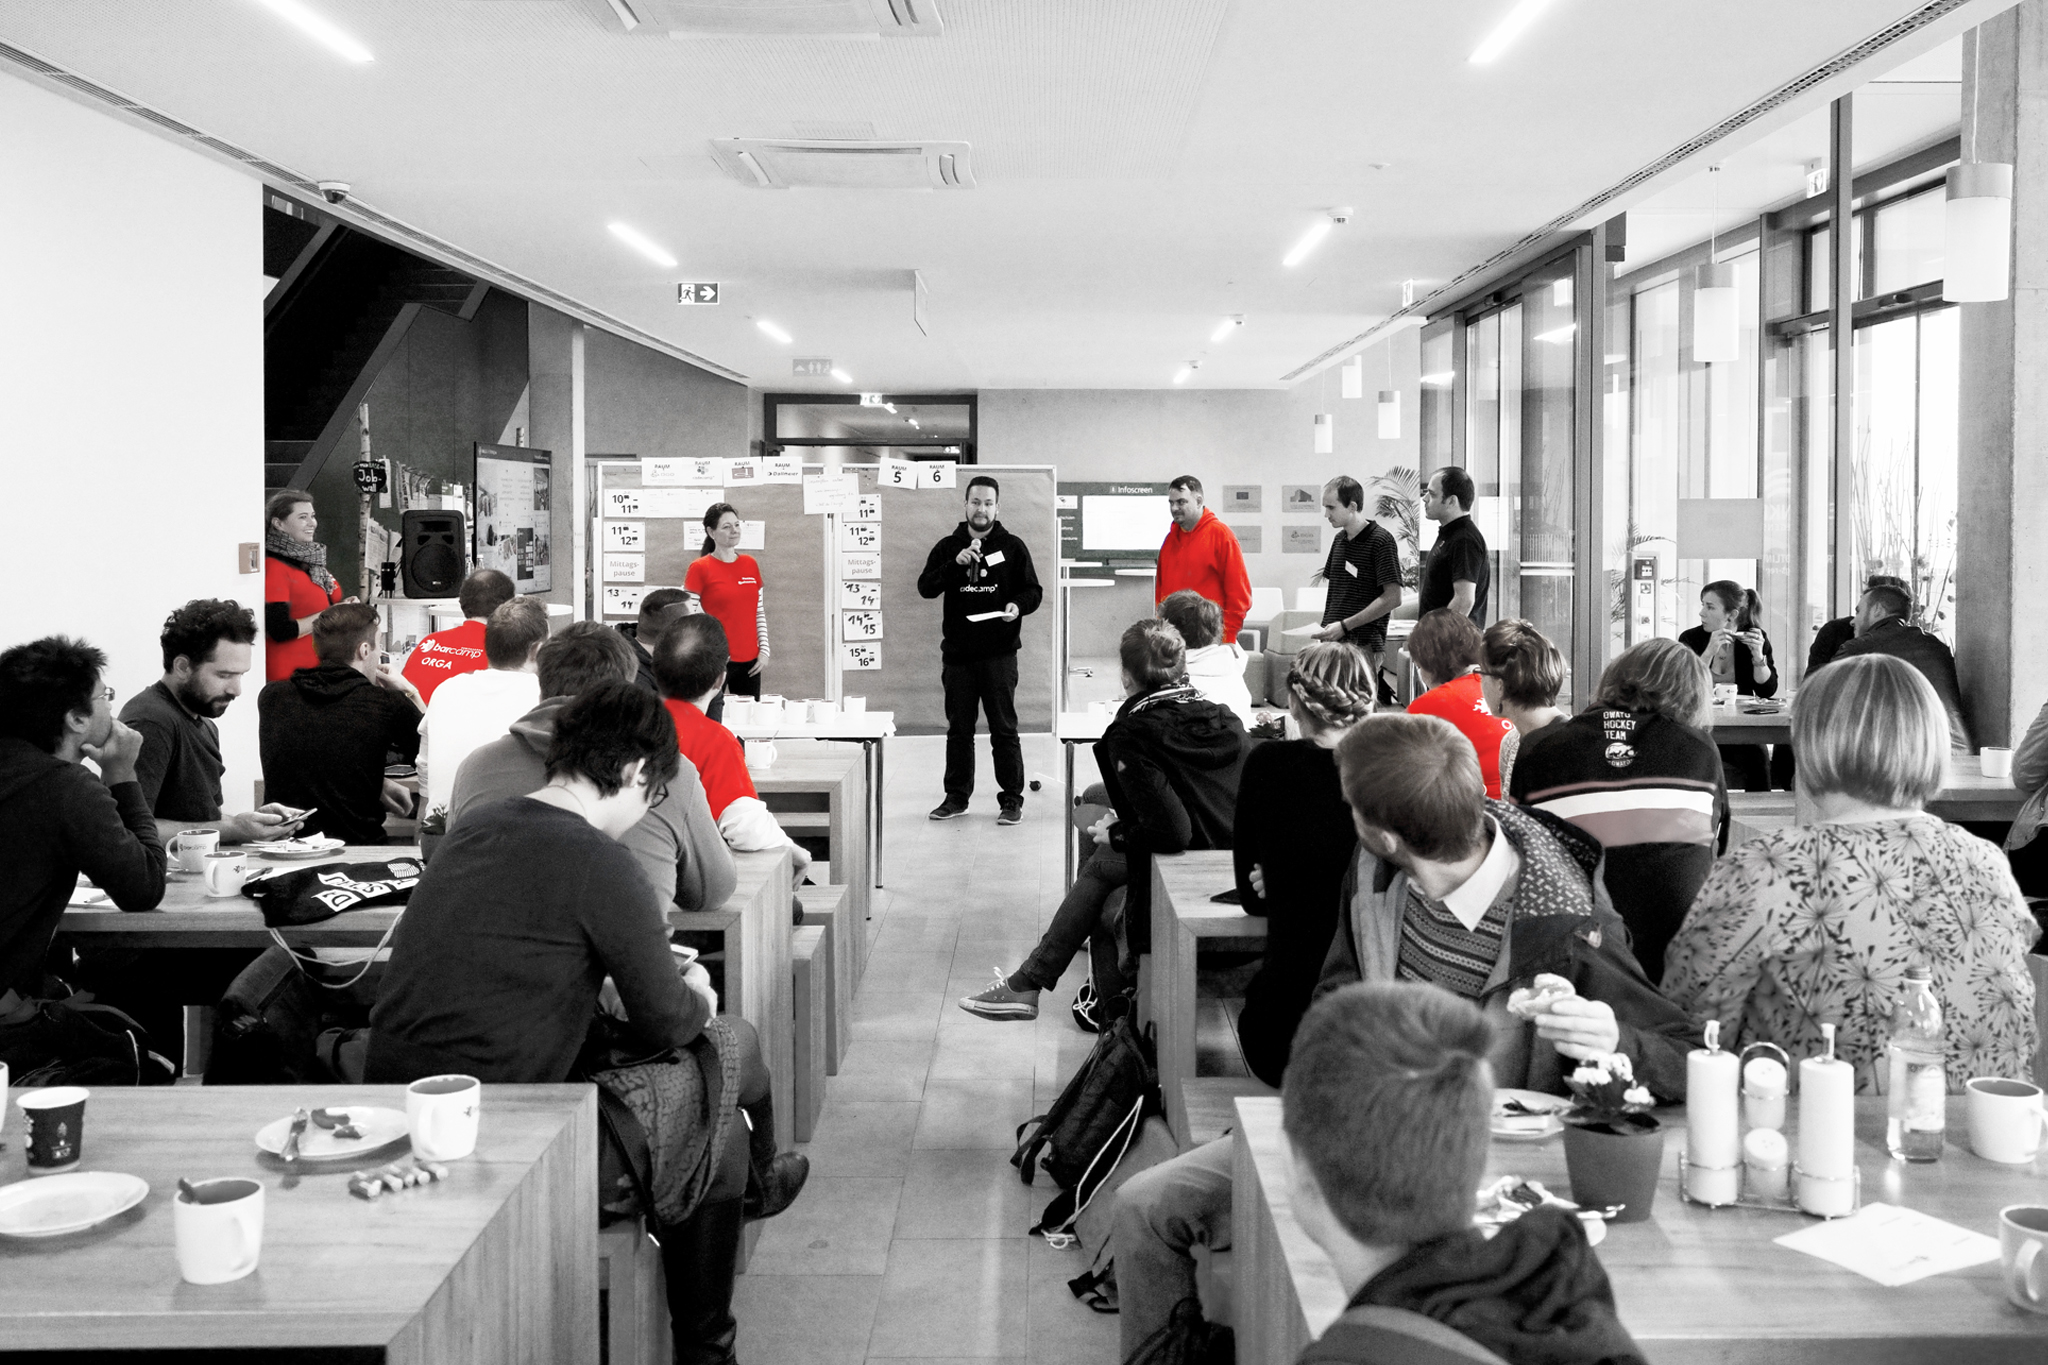 BarCamp Regensburg